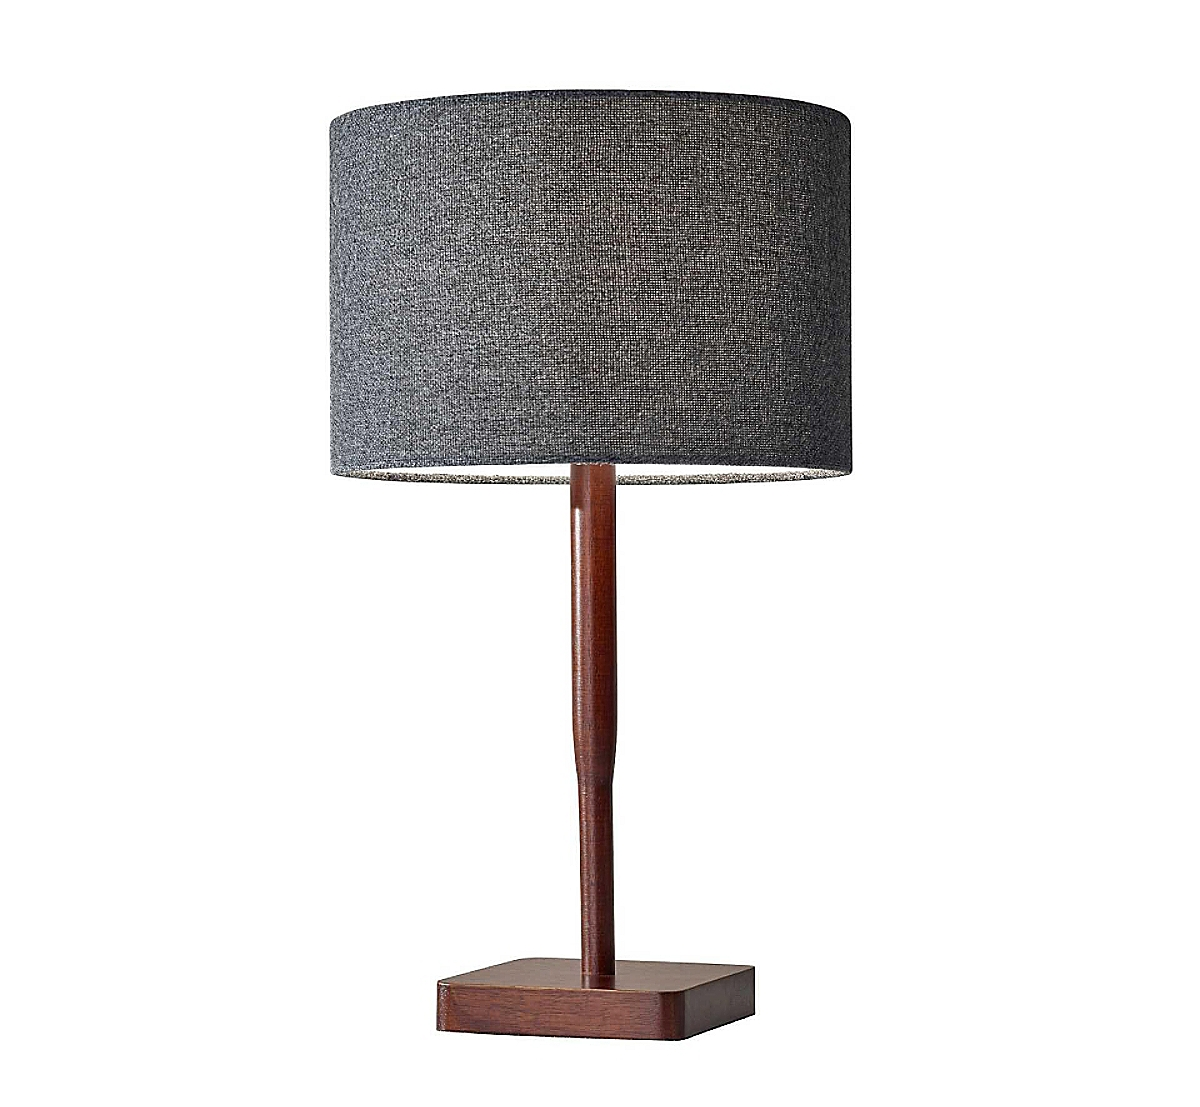 Scandinavian Table Lamp - Dark